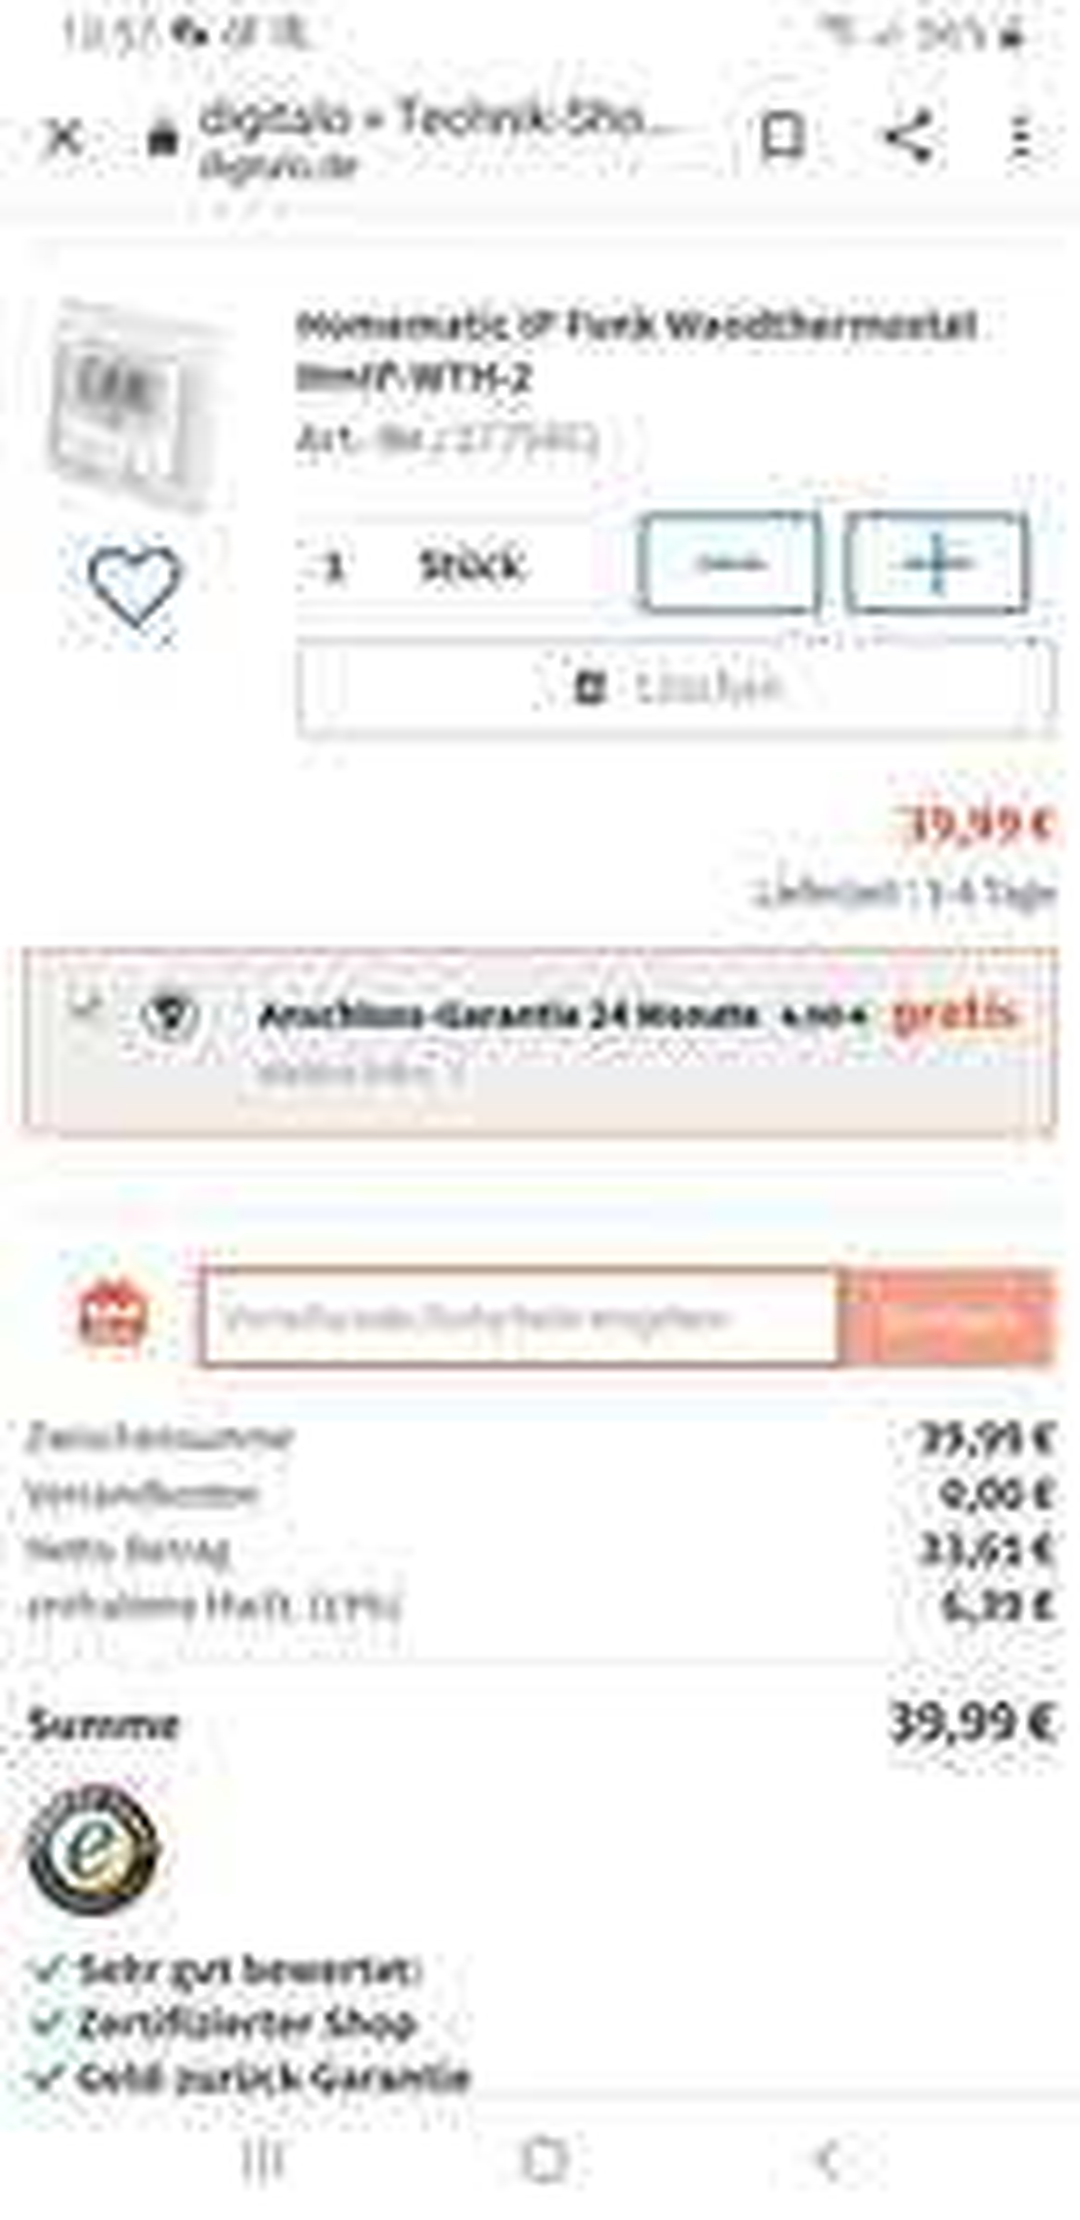 Homematic IP Funk Wandthermostat Hmip-Wth-2, Shoop 1% Rabatt, Cashback (Sofortüberweisung)